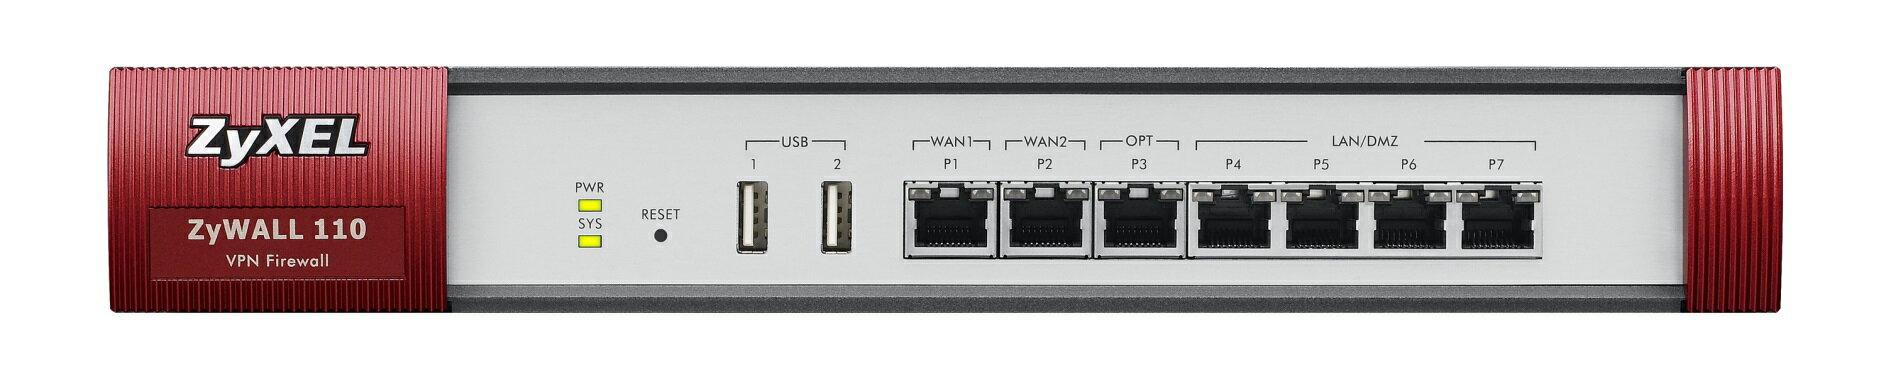 ZyXEL ZyWALL 110  網路安全設備閘道器